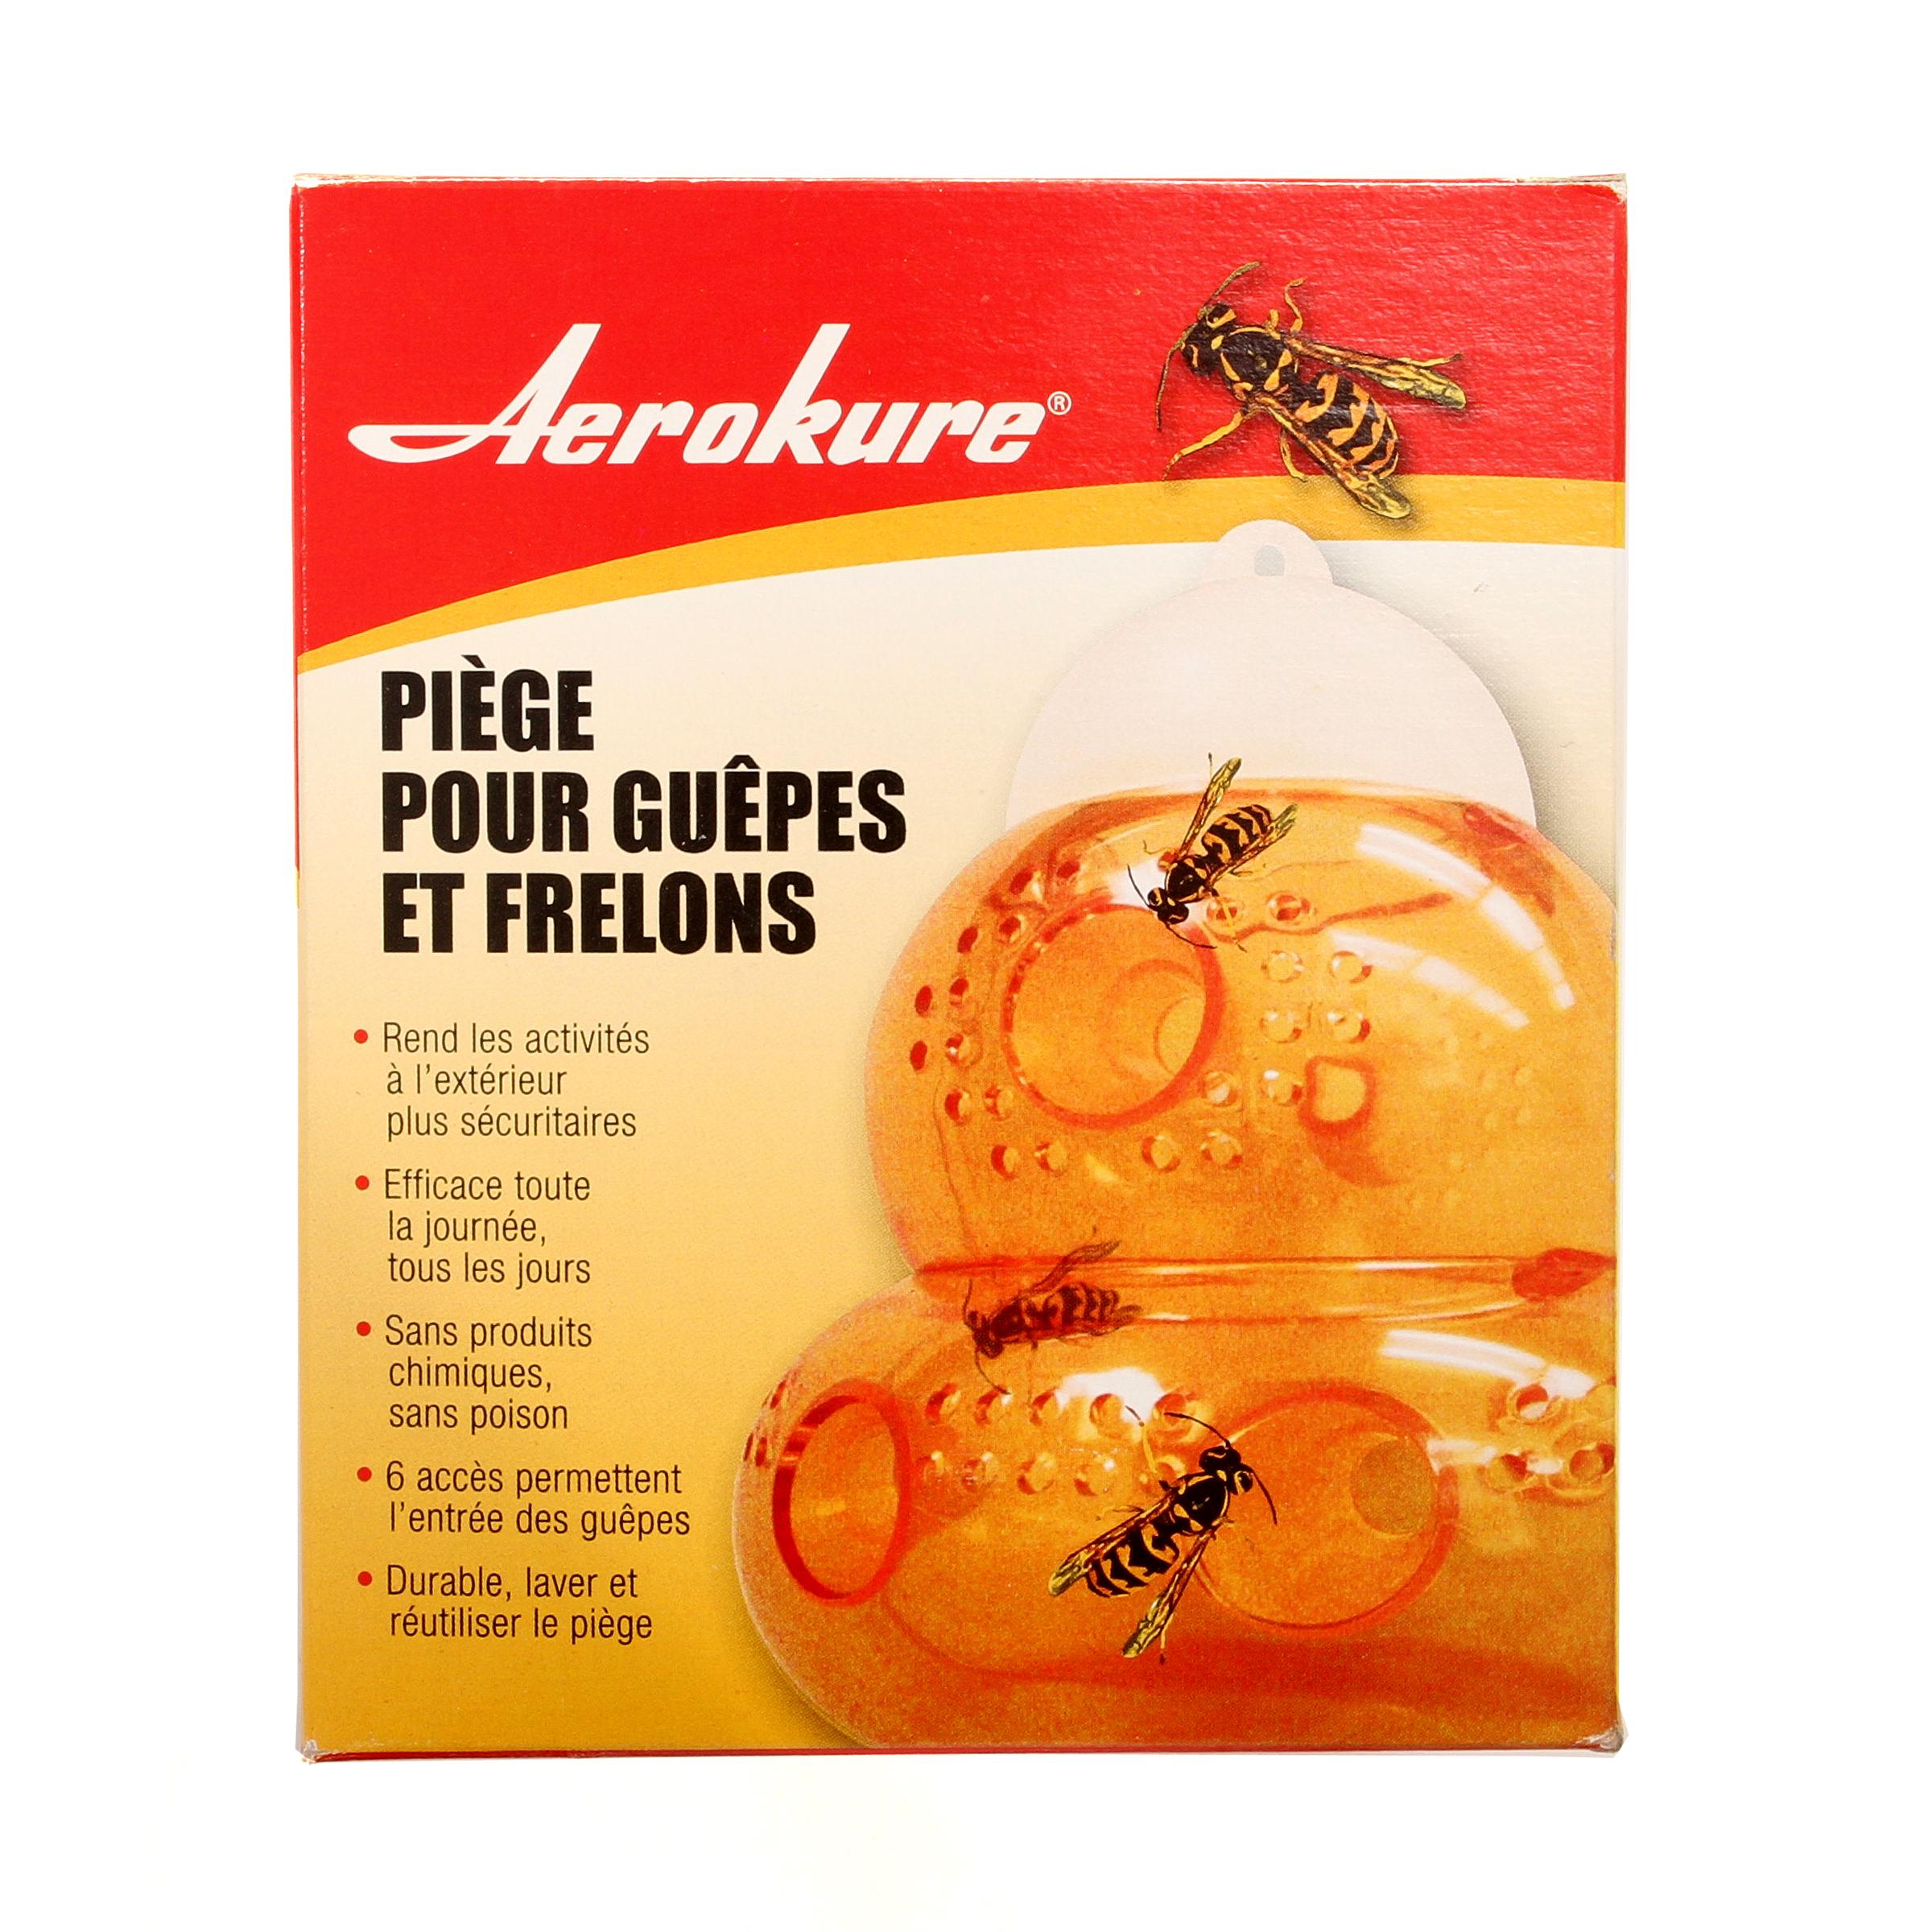 Pi ge pour gu pes et frelons aerokure international - Piege a frelons et guepes ...